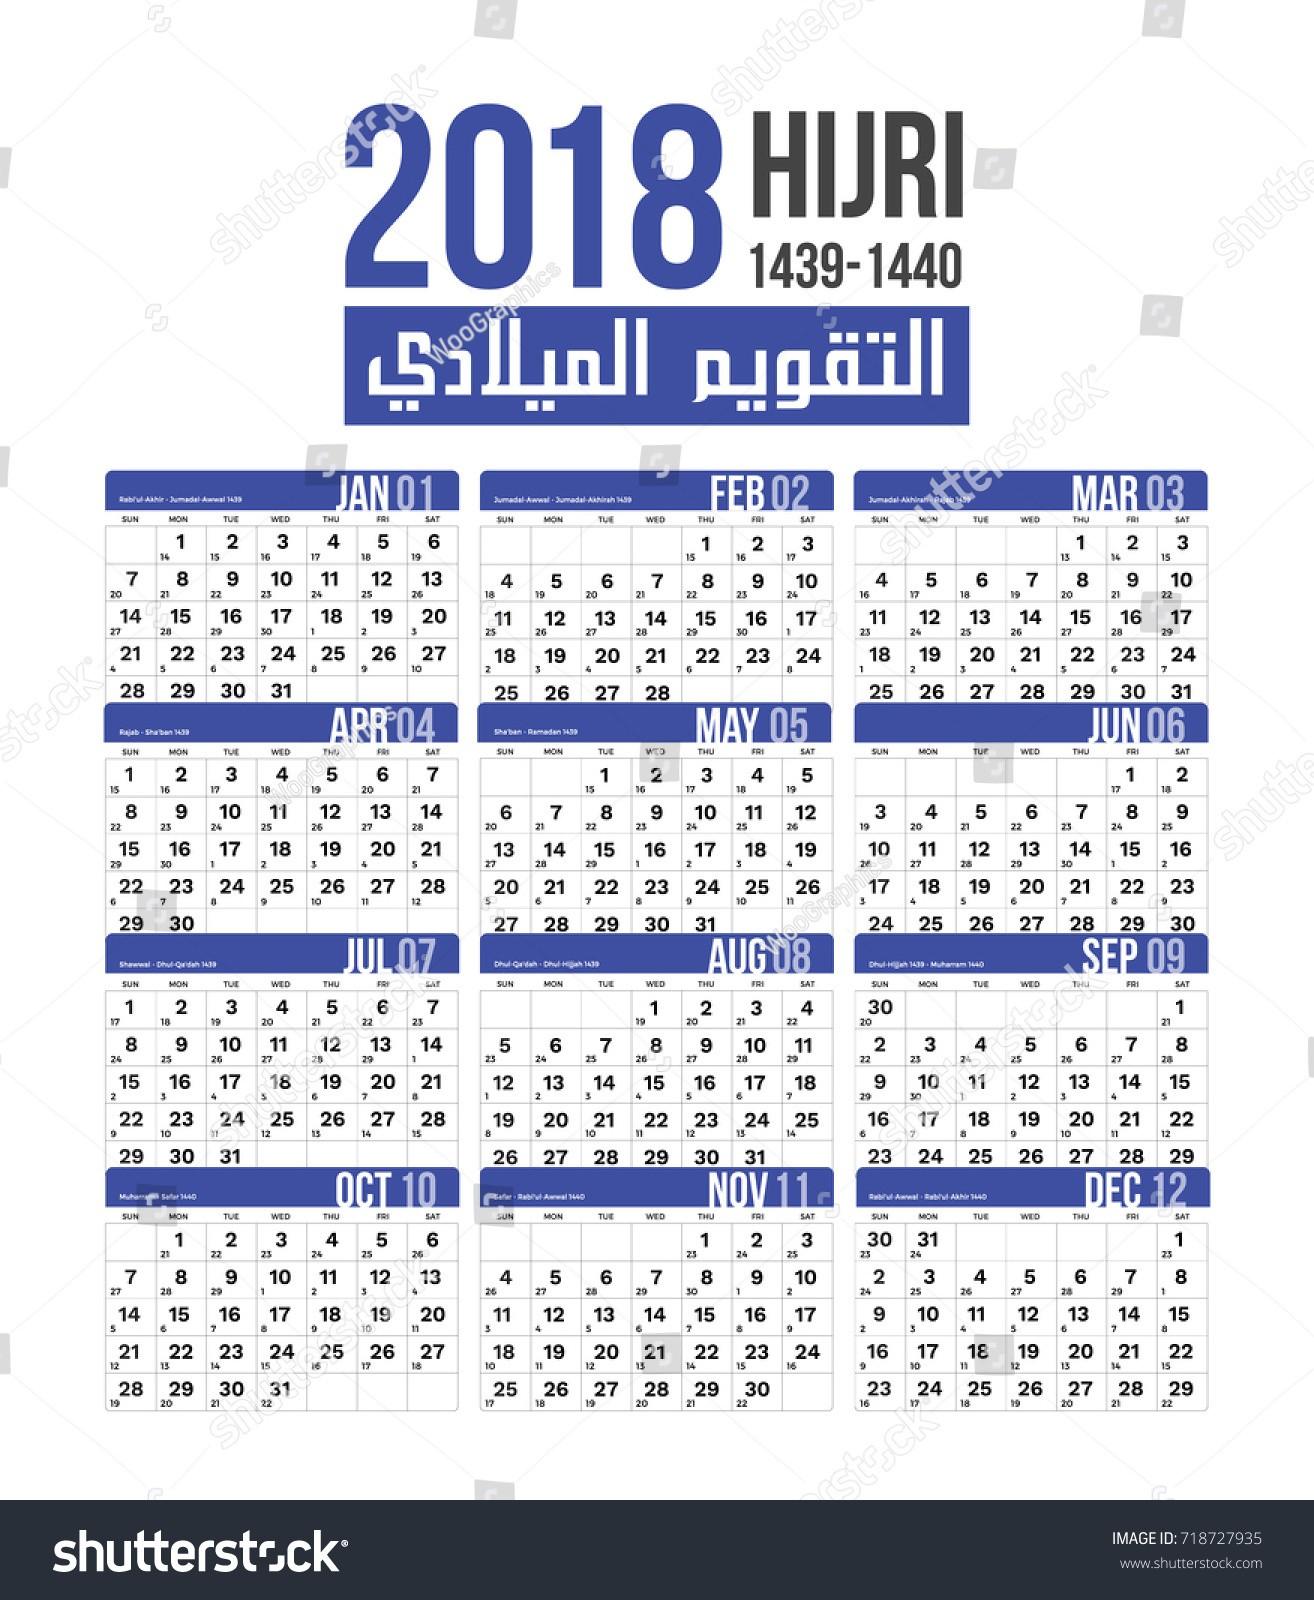 Printable islamic Calendar Hijri Calendar 2018 – Printable Calendar Templates